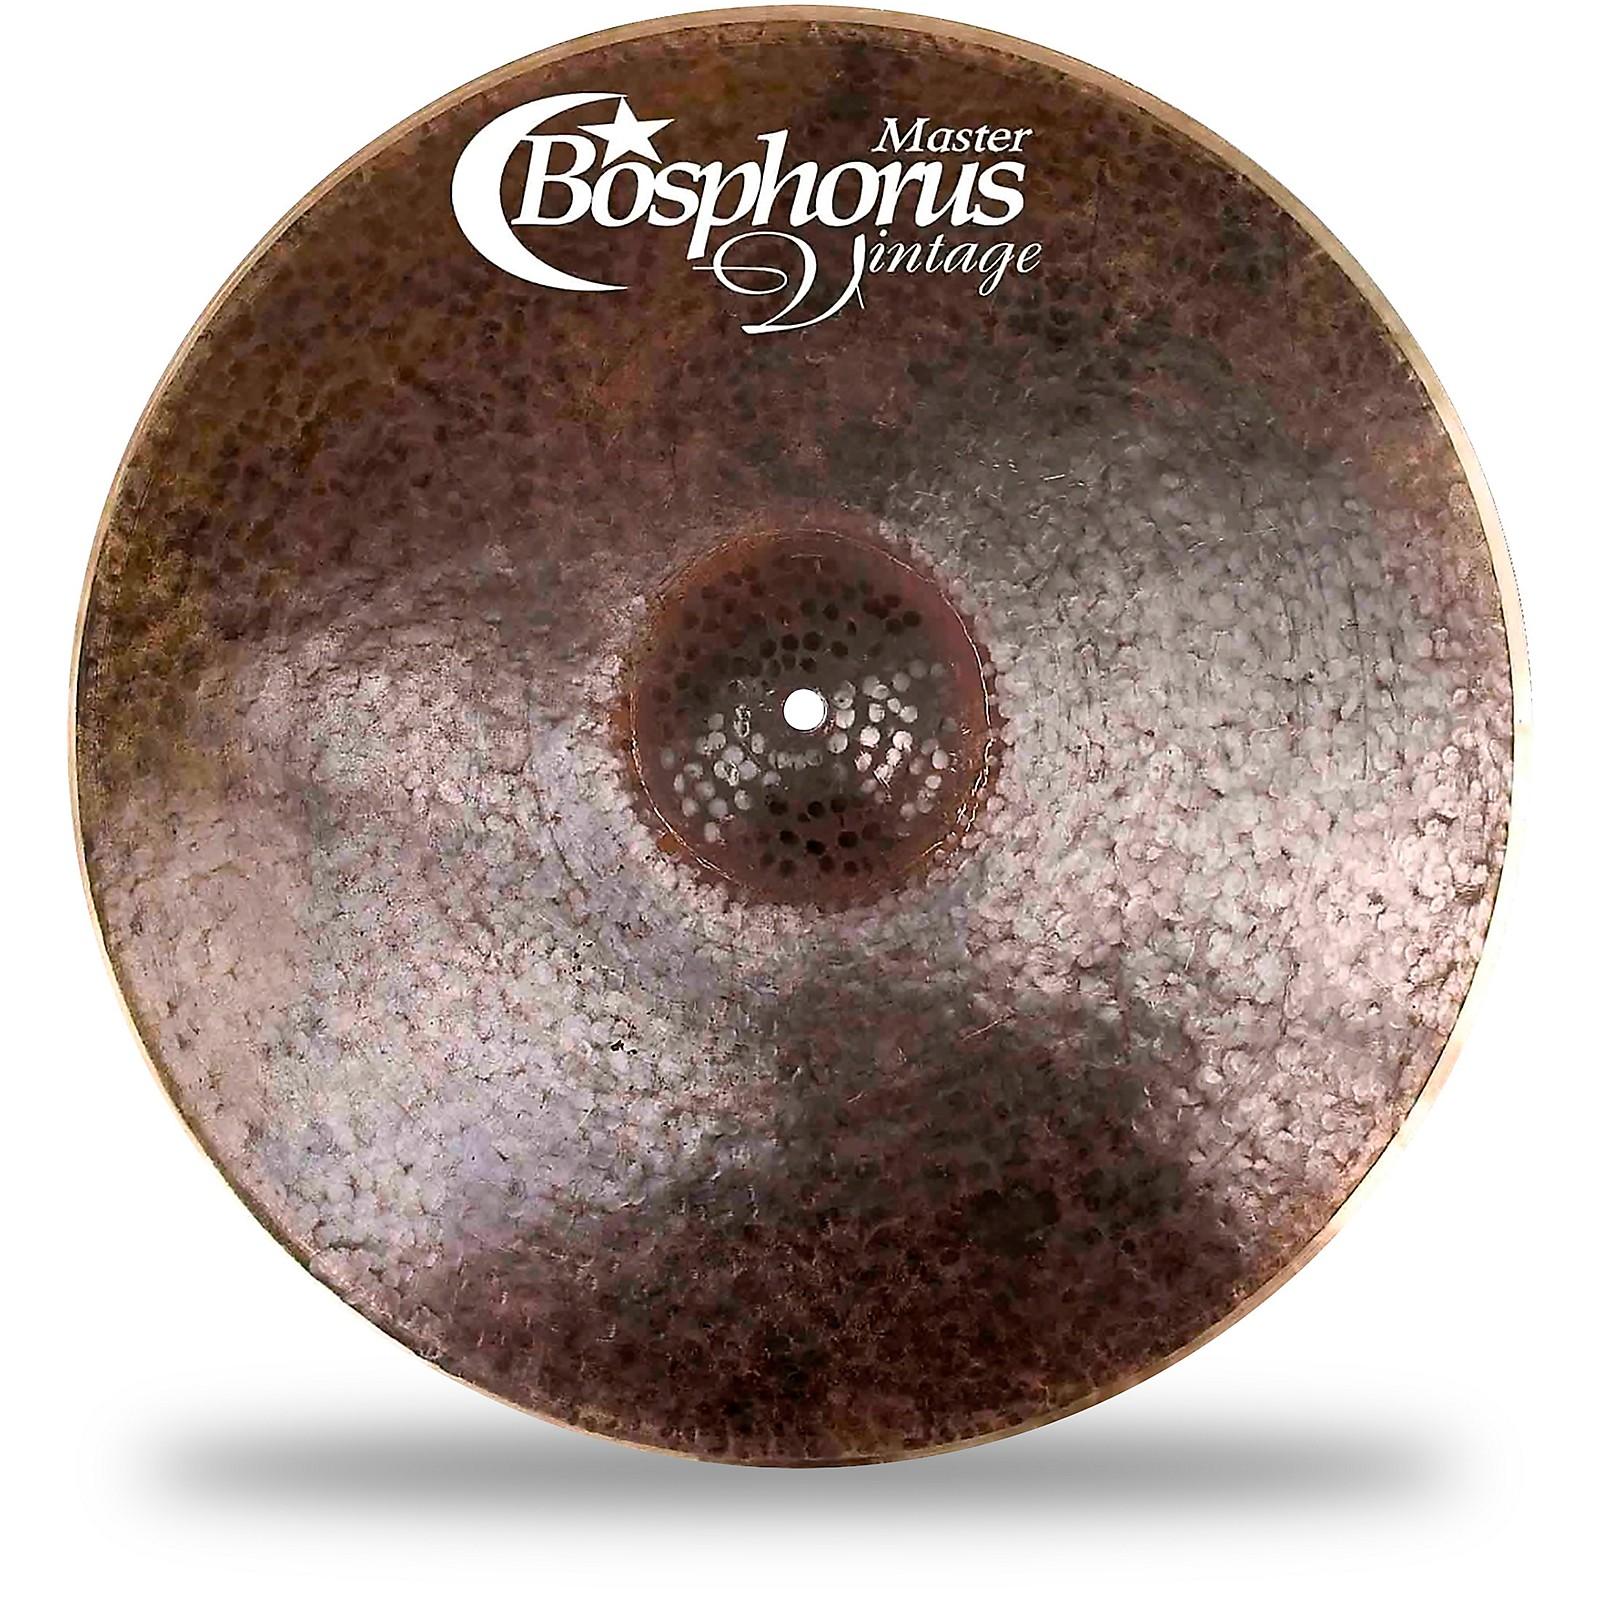 Bosphorus Cymbals Master Vintage Ride Cymbal